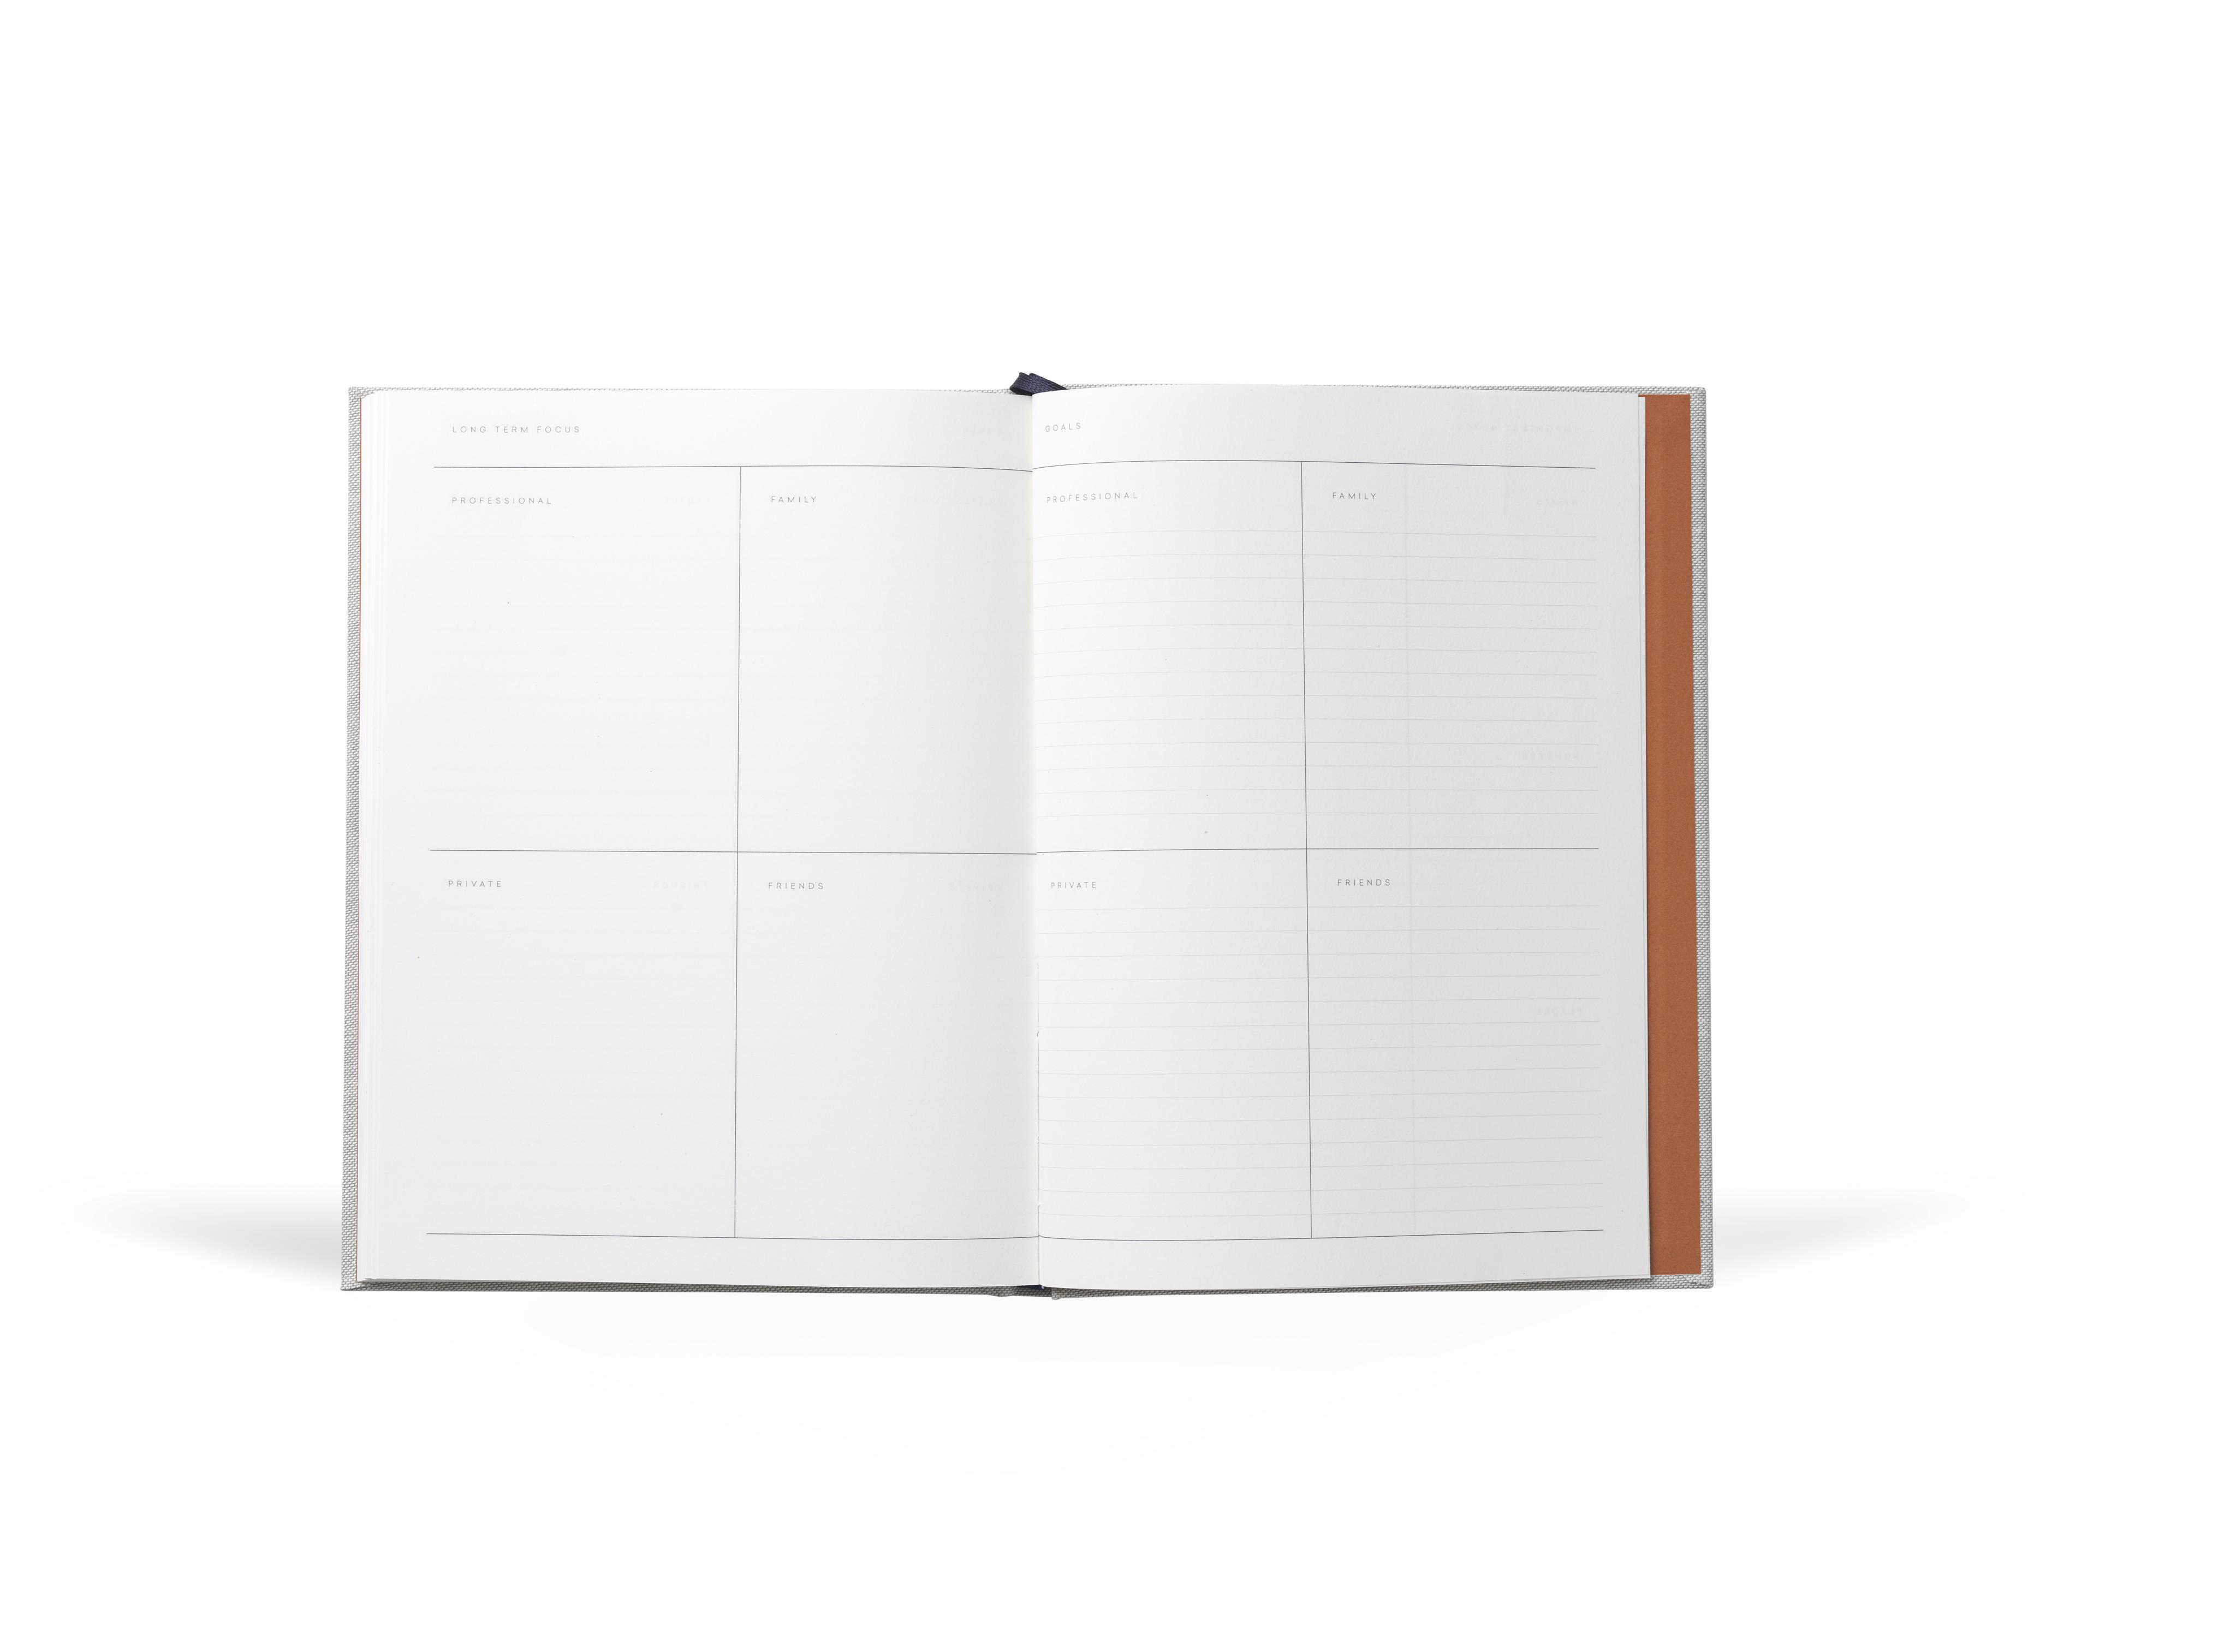 Notem – Even Work Journal – Grey Cloth